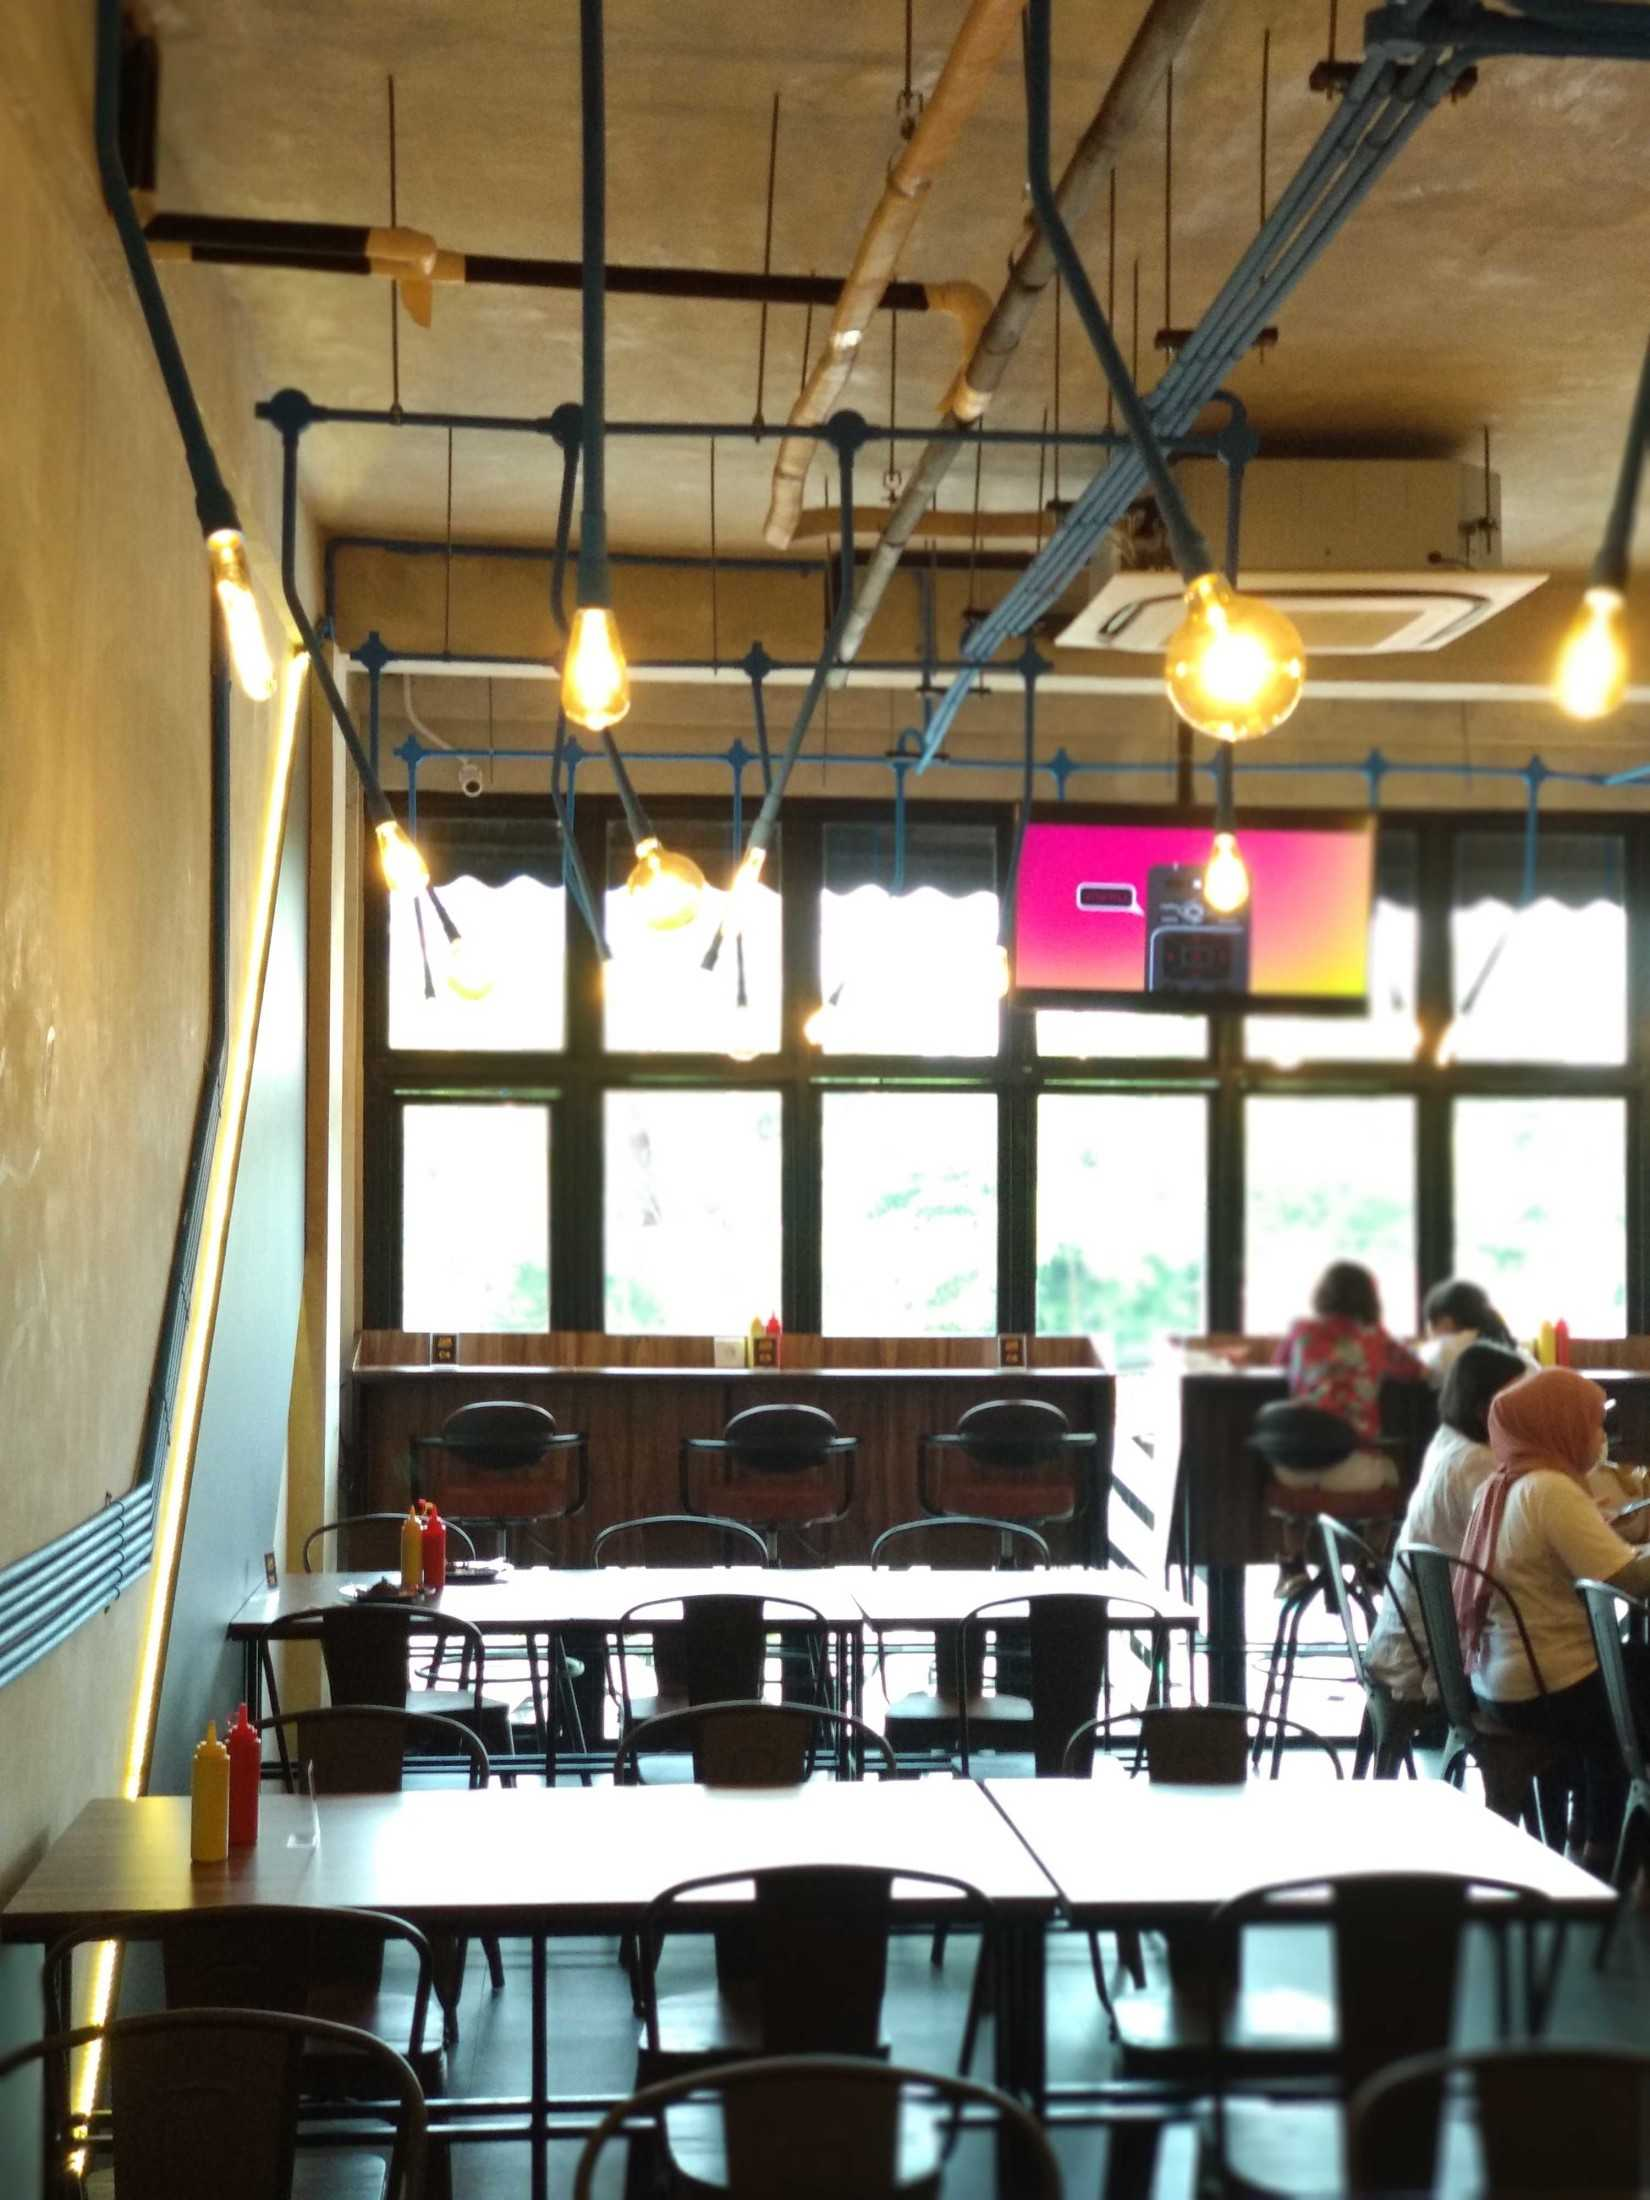 Im Design Associates I Steak U Restaurant Cibubur, Kec. Ciracas, Kota Jakarta Timur, Daerah Khusus Ibukota Jakarta, Indonesia Cibubur, Kec. Ciracas, Kota Jakarta Timur, Daerah Khusus Ibukota Jakarta, Indonesia Im-Design-Associates-I-Steak-U-Restaurant  73153